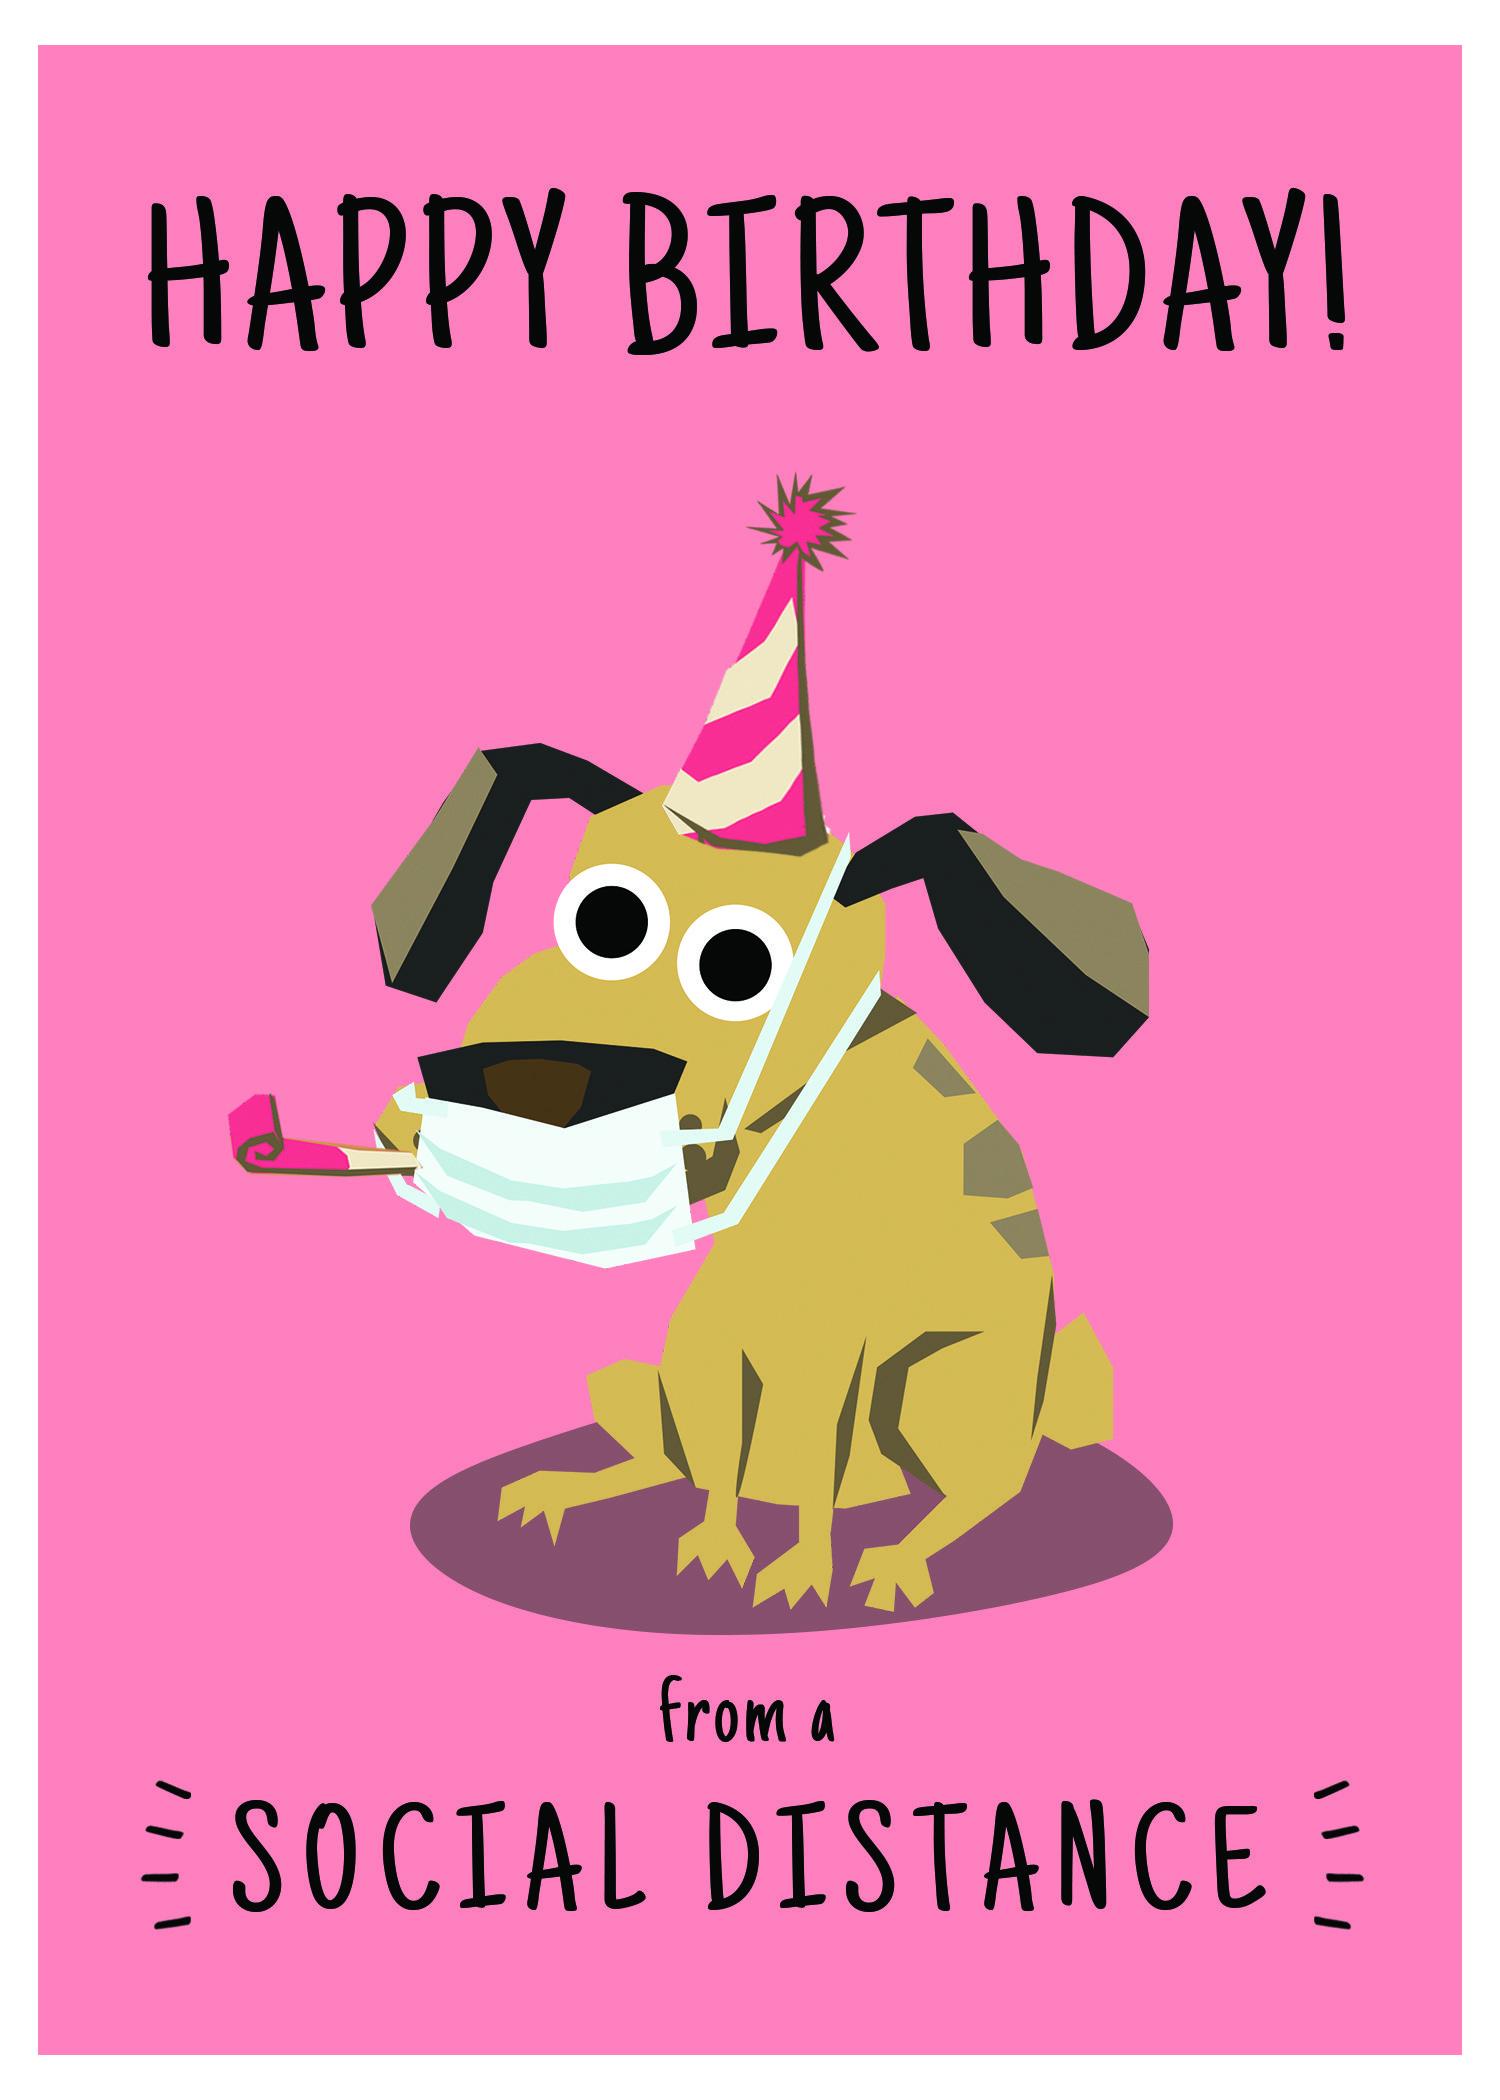 Happy Birthday Wiches Quarantine Birthday Card Cute Dog Yesbirthday Home Of Birthday Wishes Inspiration